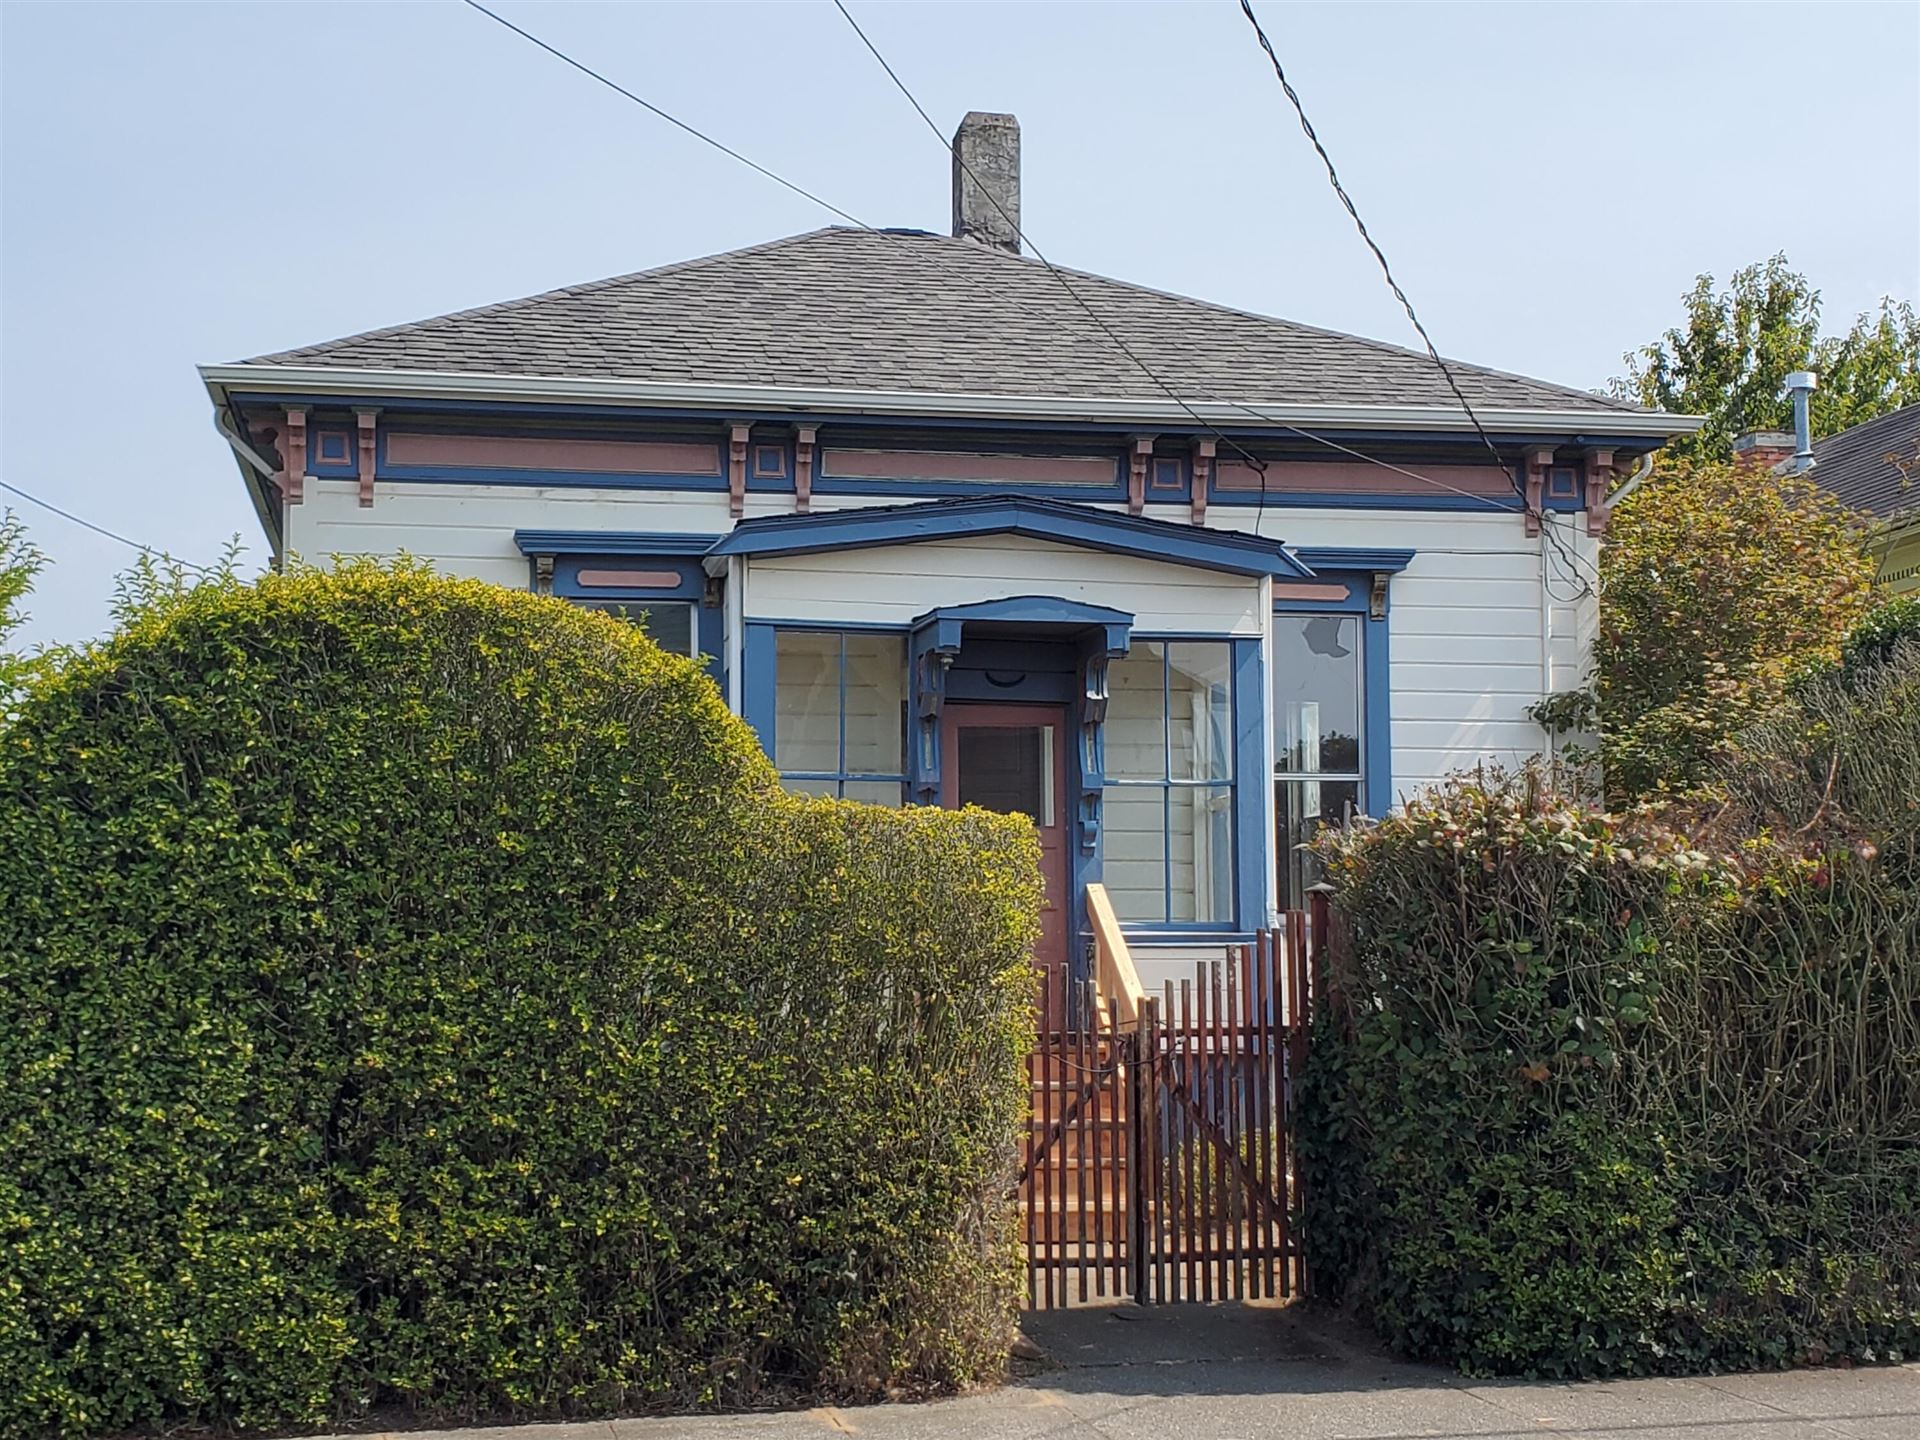 1003 C Street, Eureka, CA 95501 - MLS#: 260084